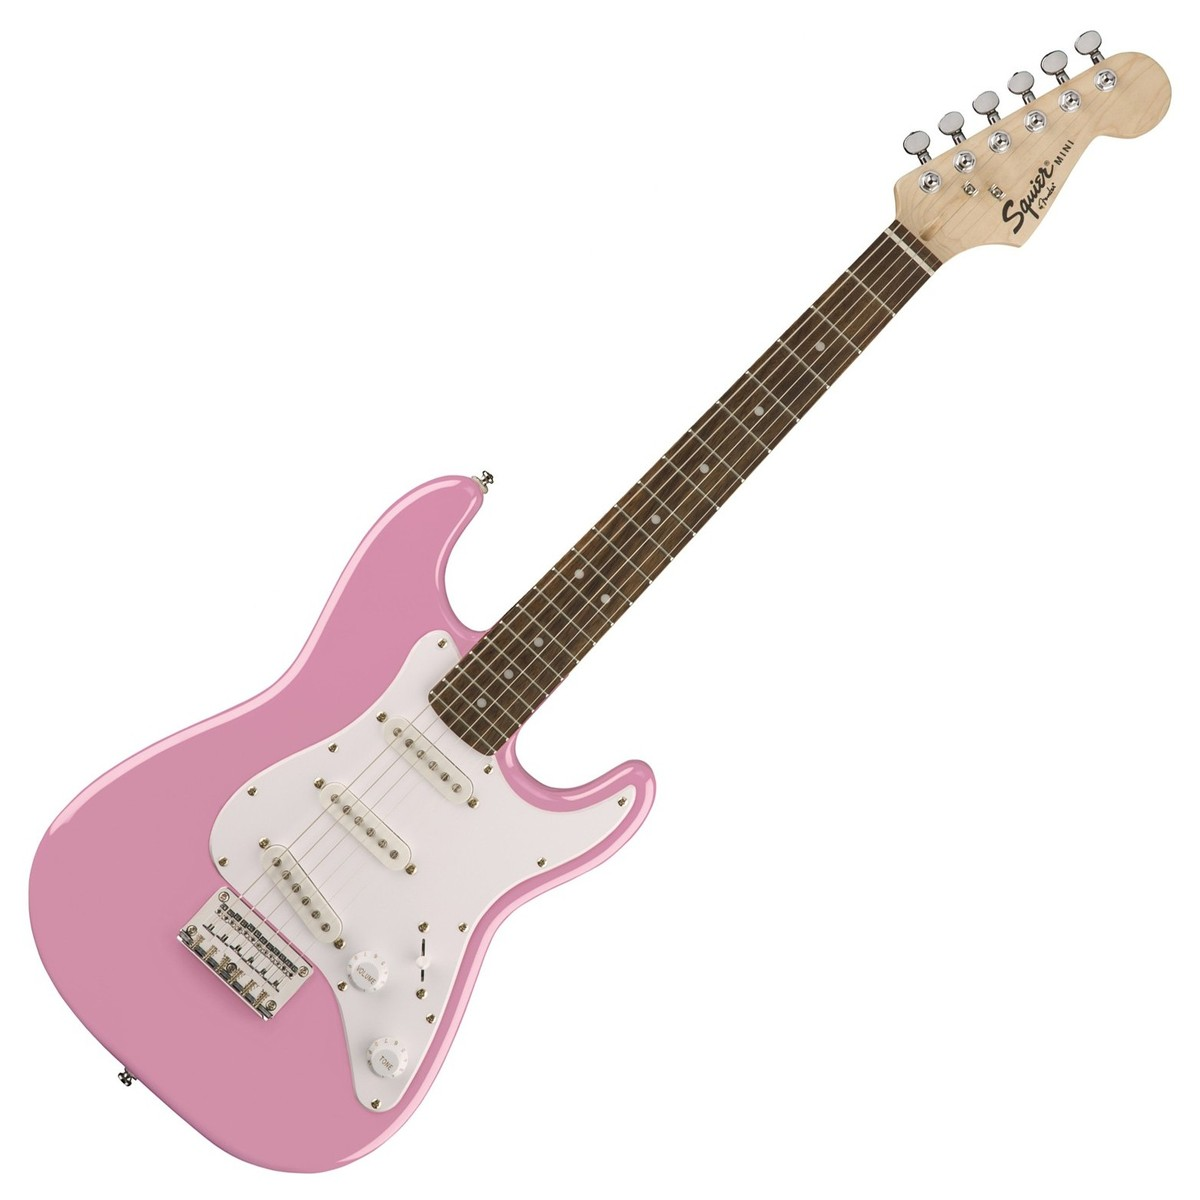 squier by fender par fender guitare lectrique de mini stratocaster 3 4 taille rose. Black Bedroom Furniture Sets. Home Design Ideas